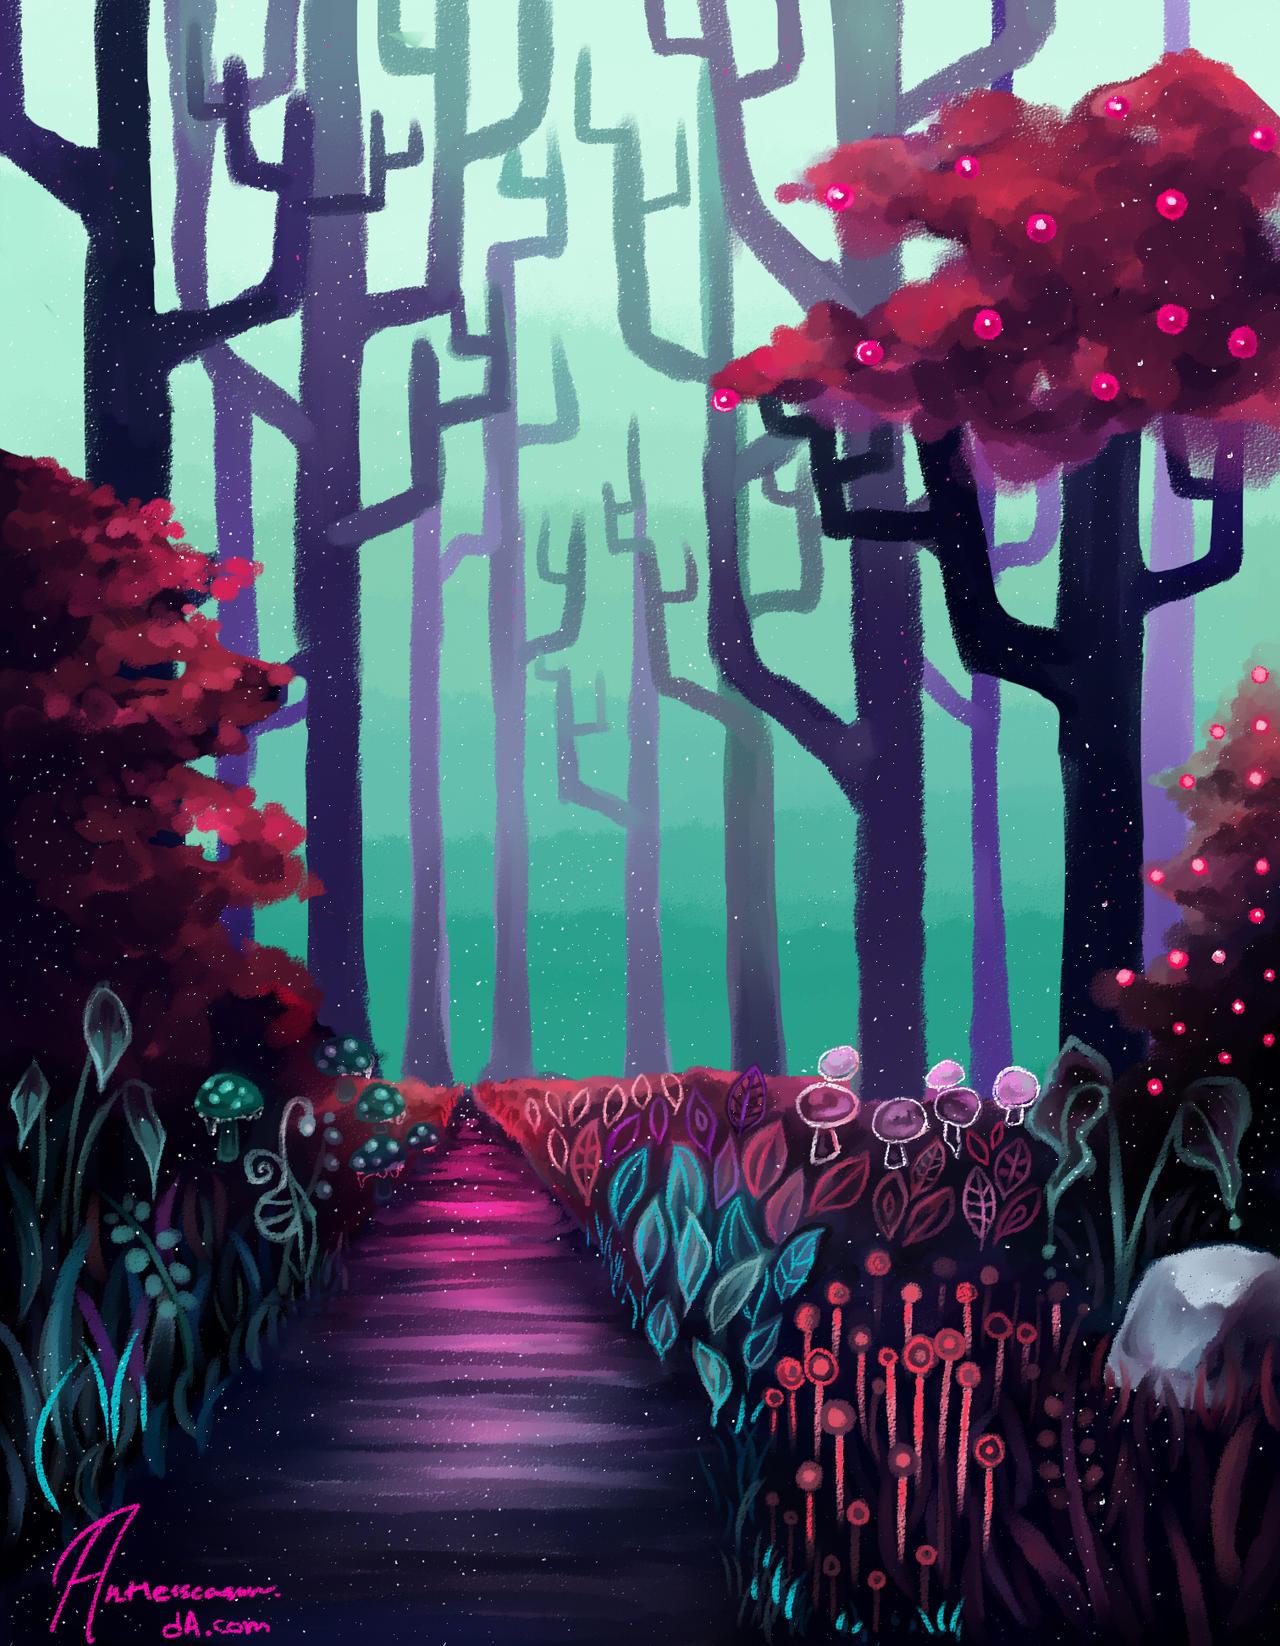 Sugar Plum Fairy Forest by antlerseason